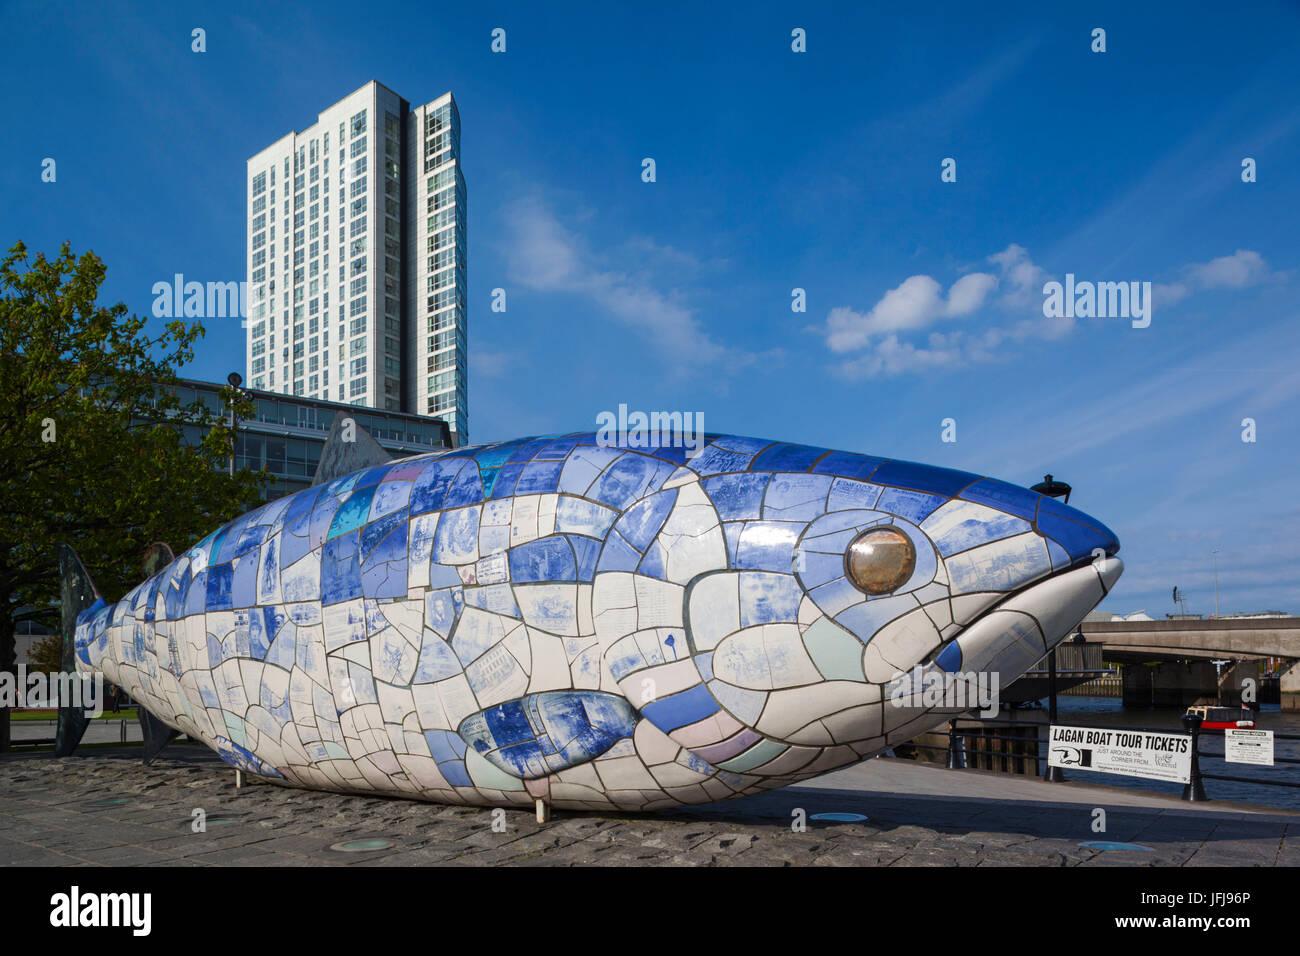 UK, Northern Ireland, Belfast, Bigfish sculpture by John Kindness, riverfront Stock Photo